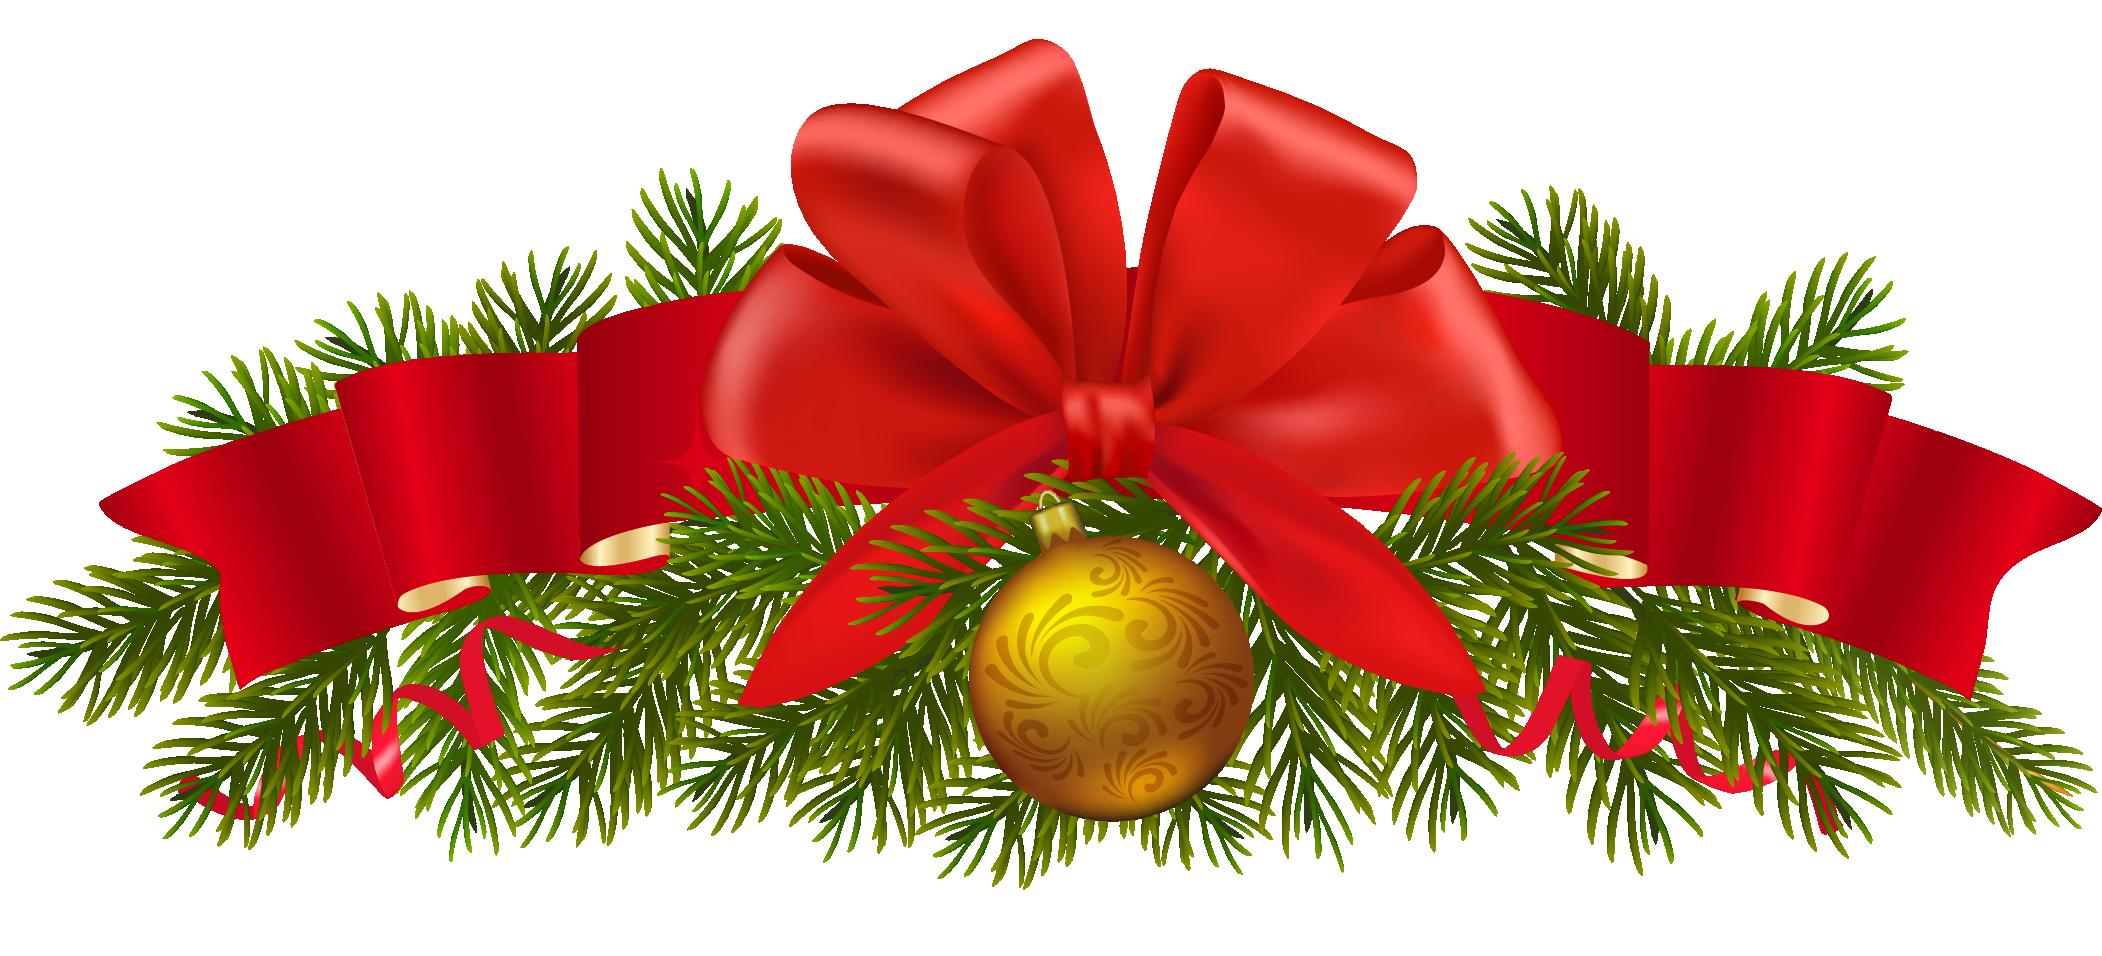 Festive Decorations Clipart